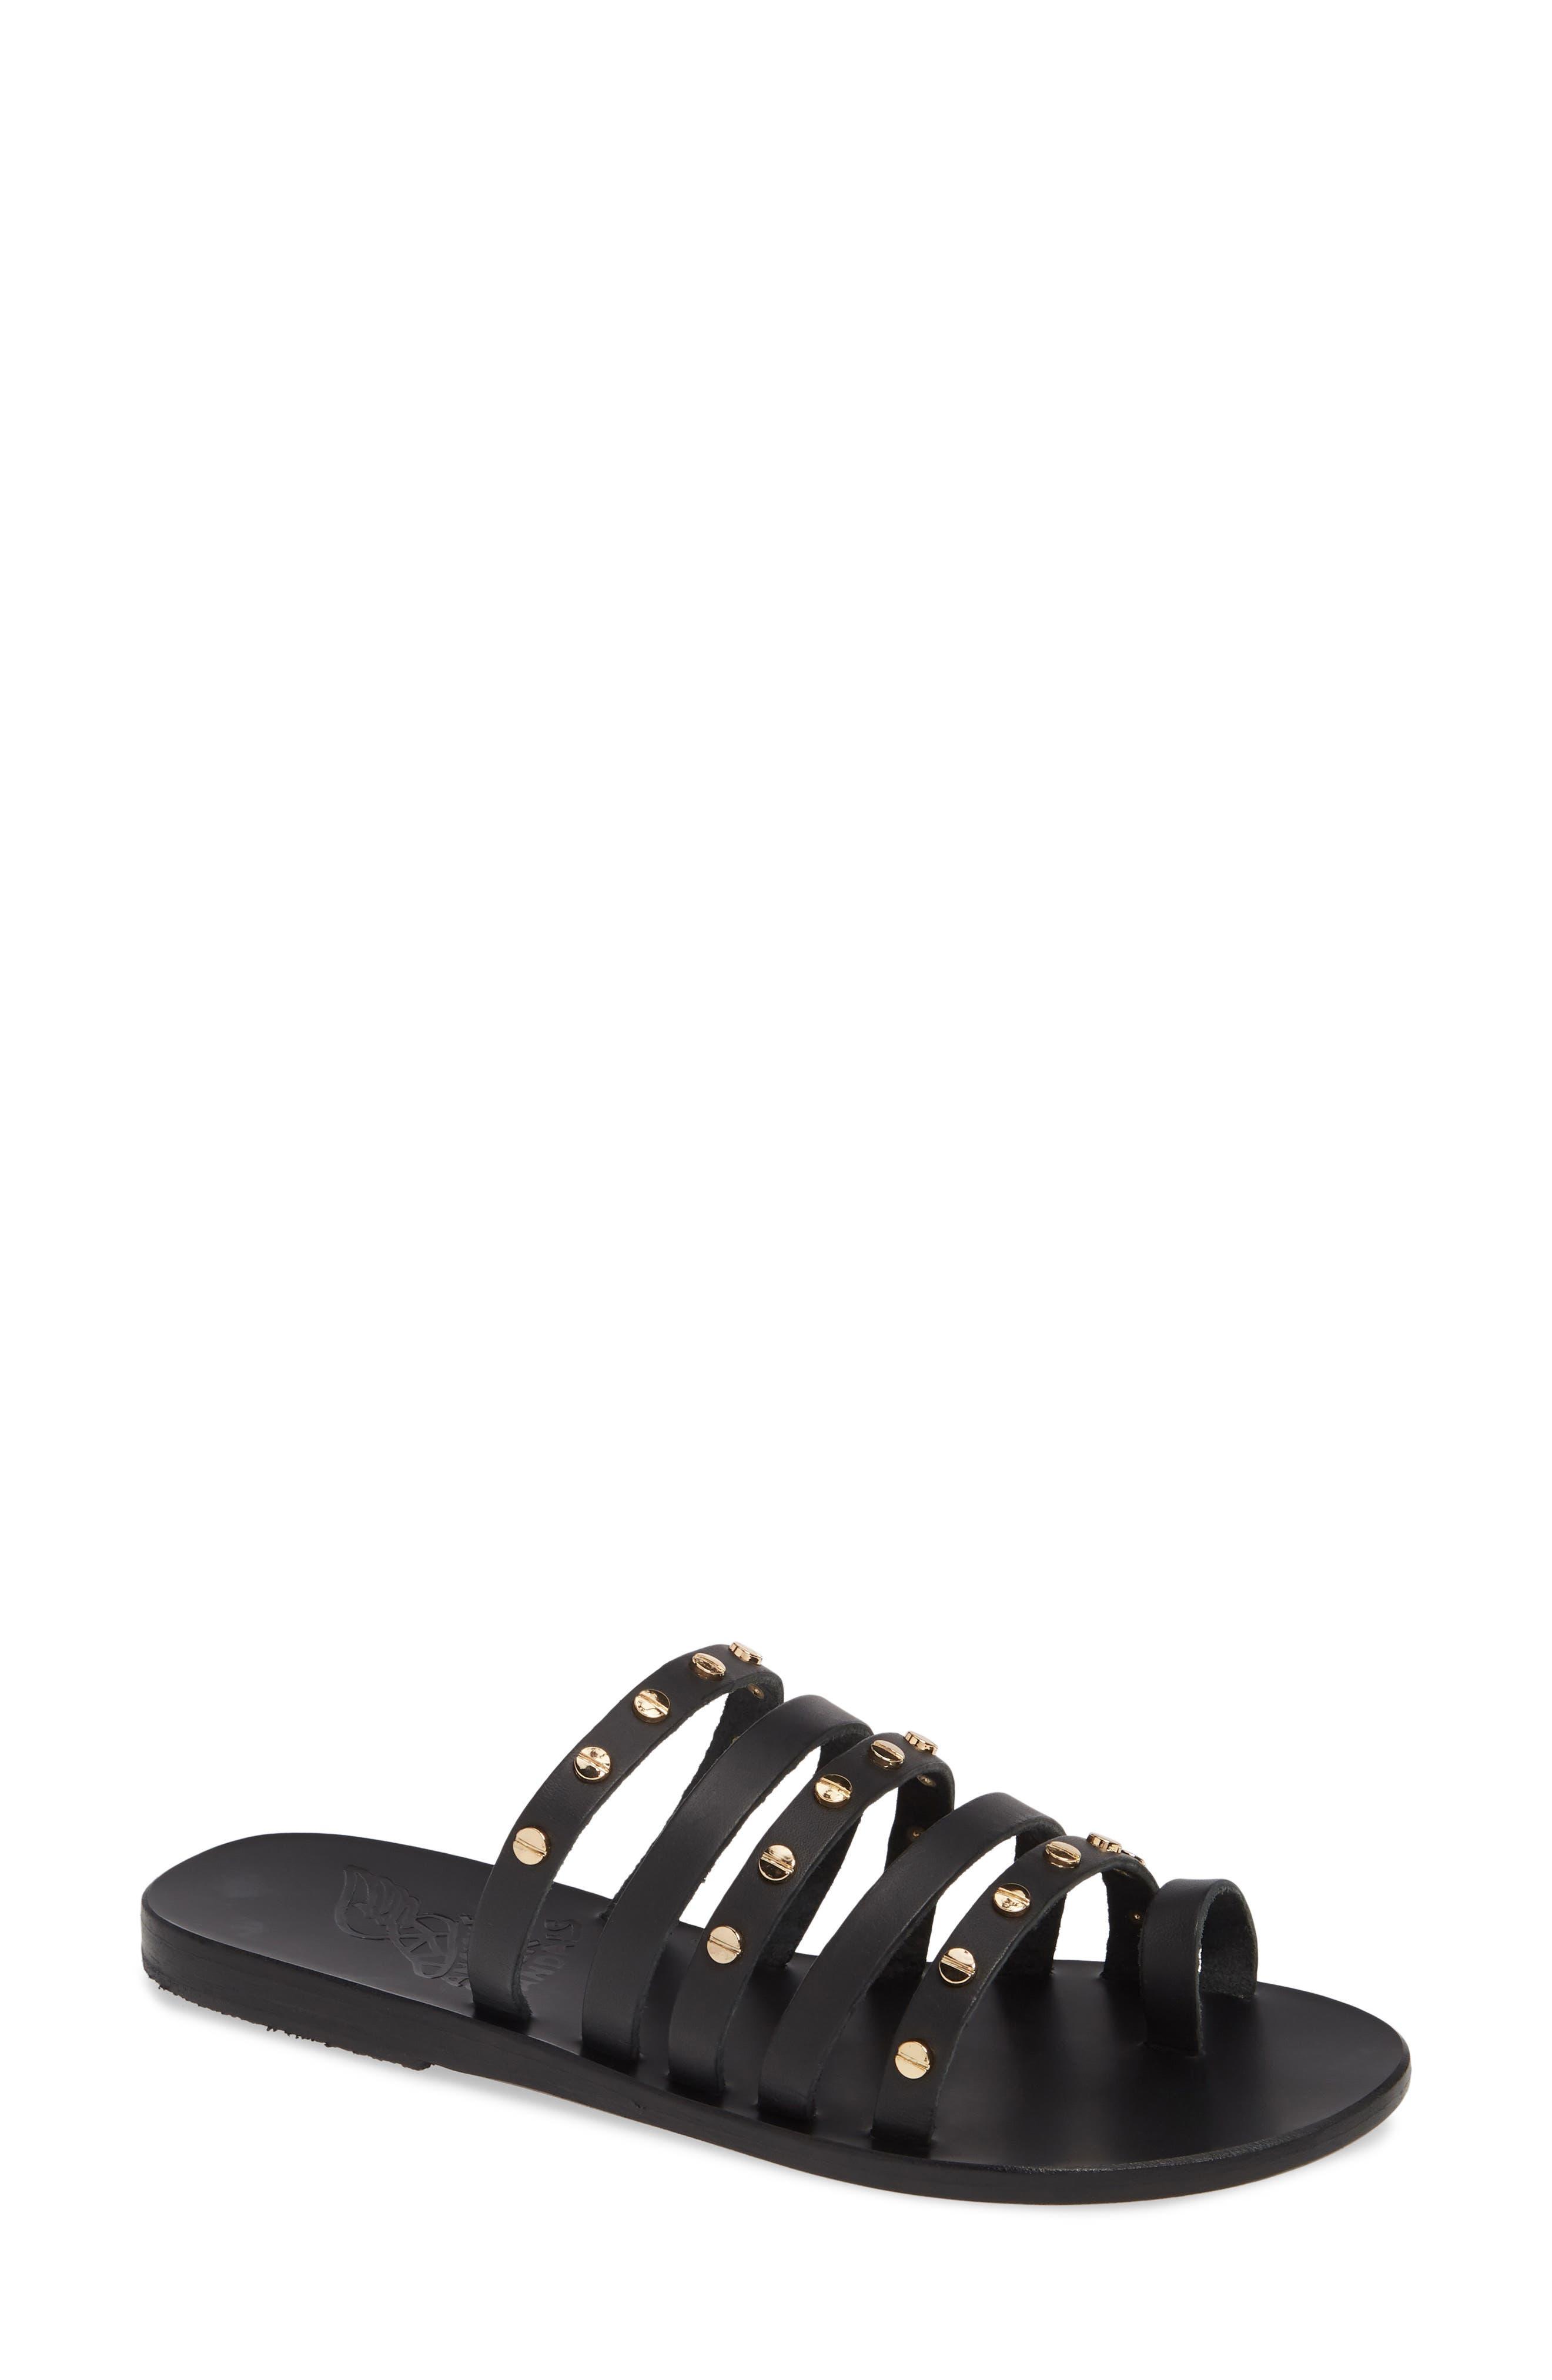 ANCIENT GREEK SANDALS,                             Niki Nails Sandal,                             Main thumbnail 1, color,                             BLACK